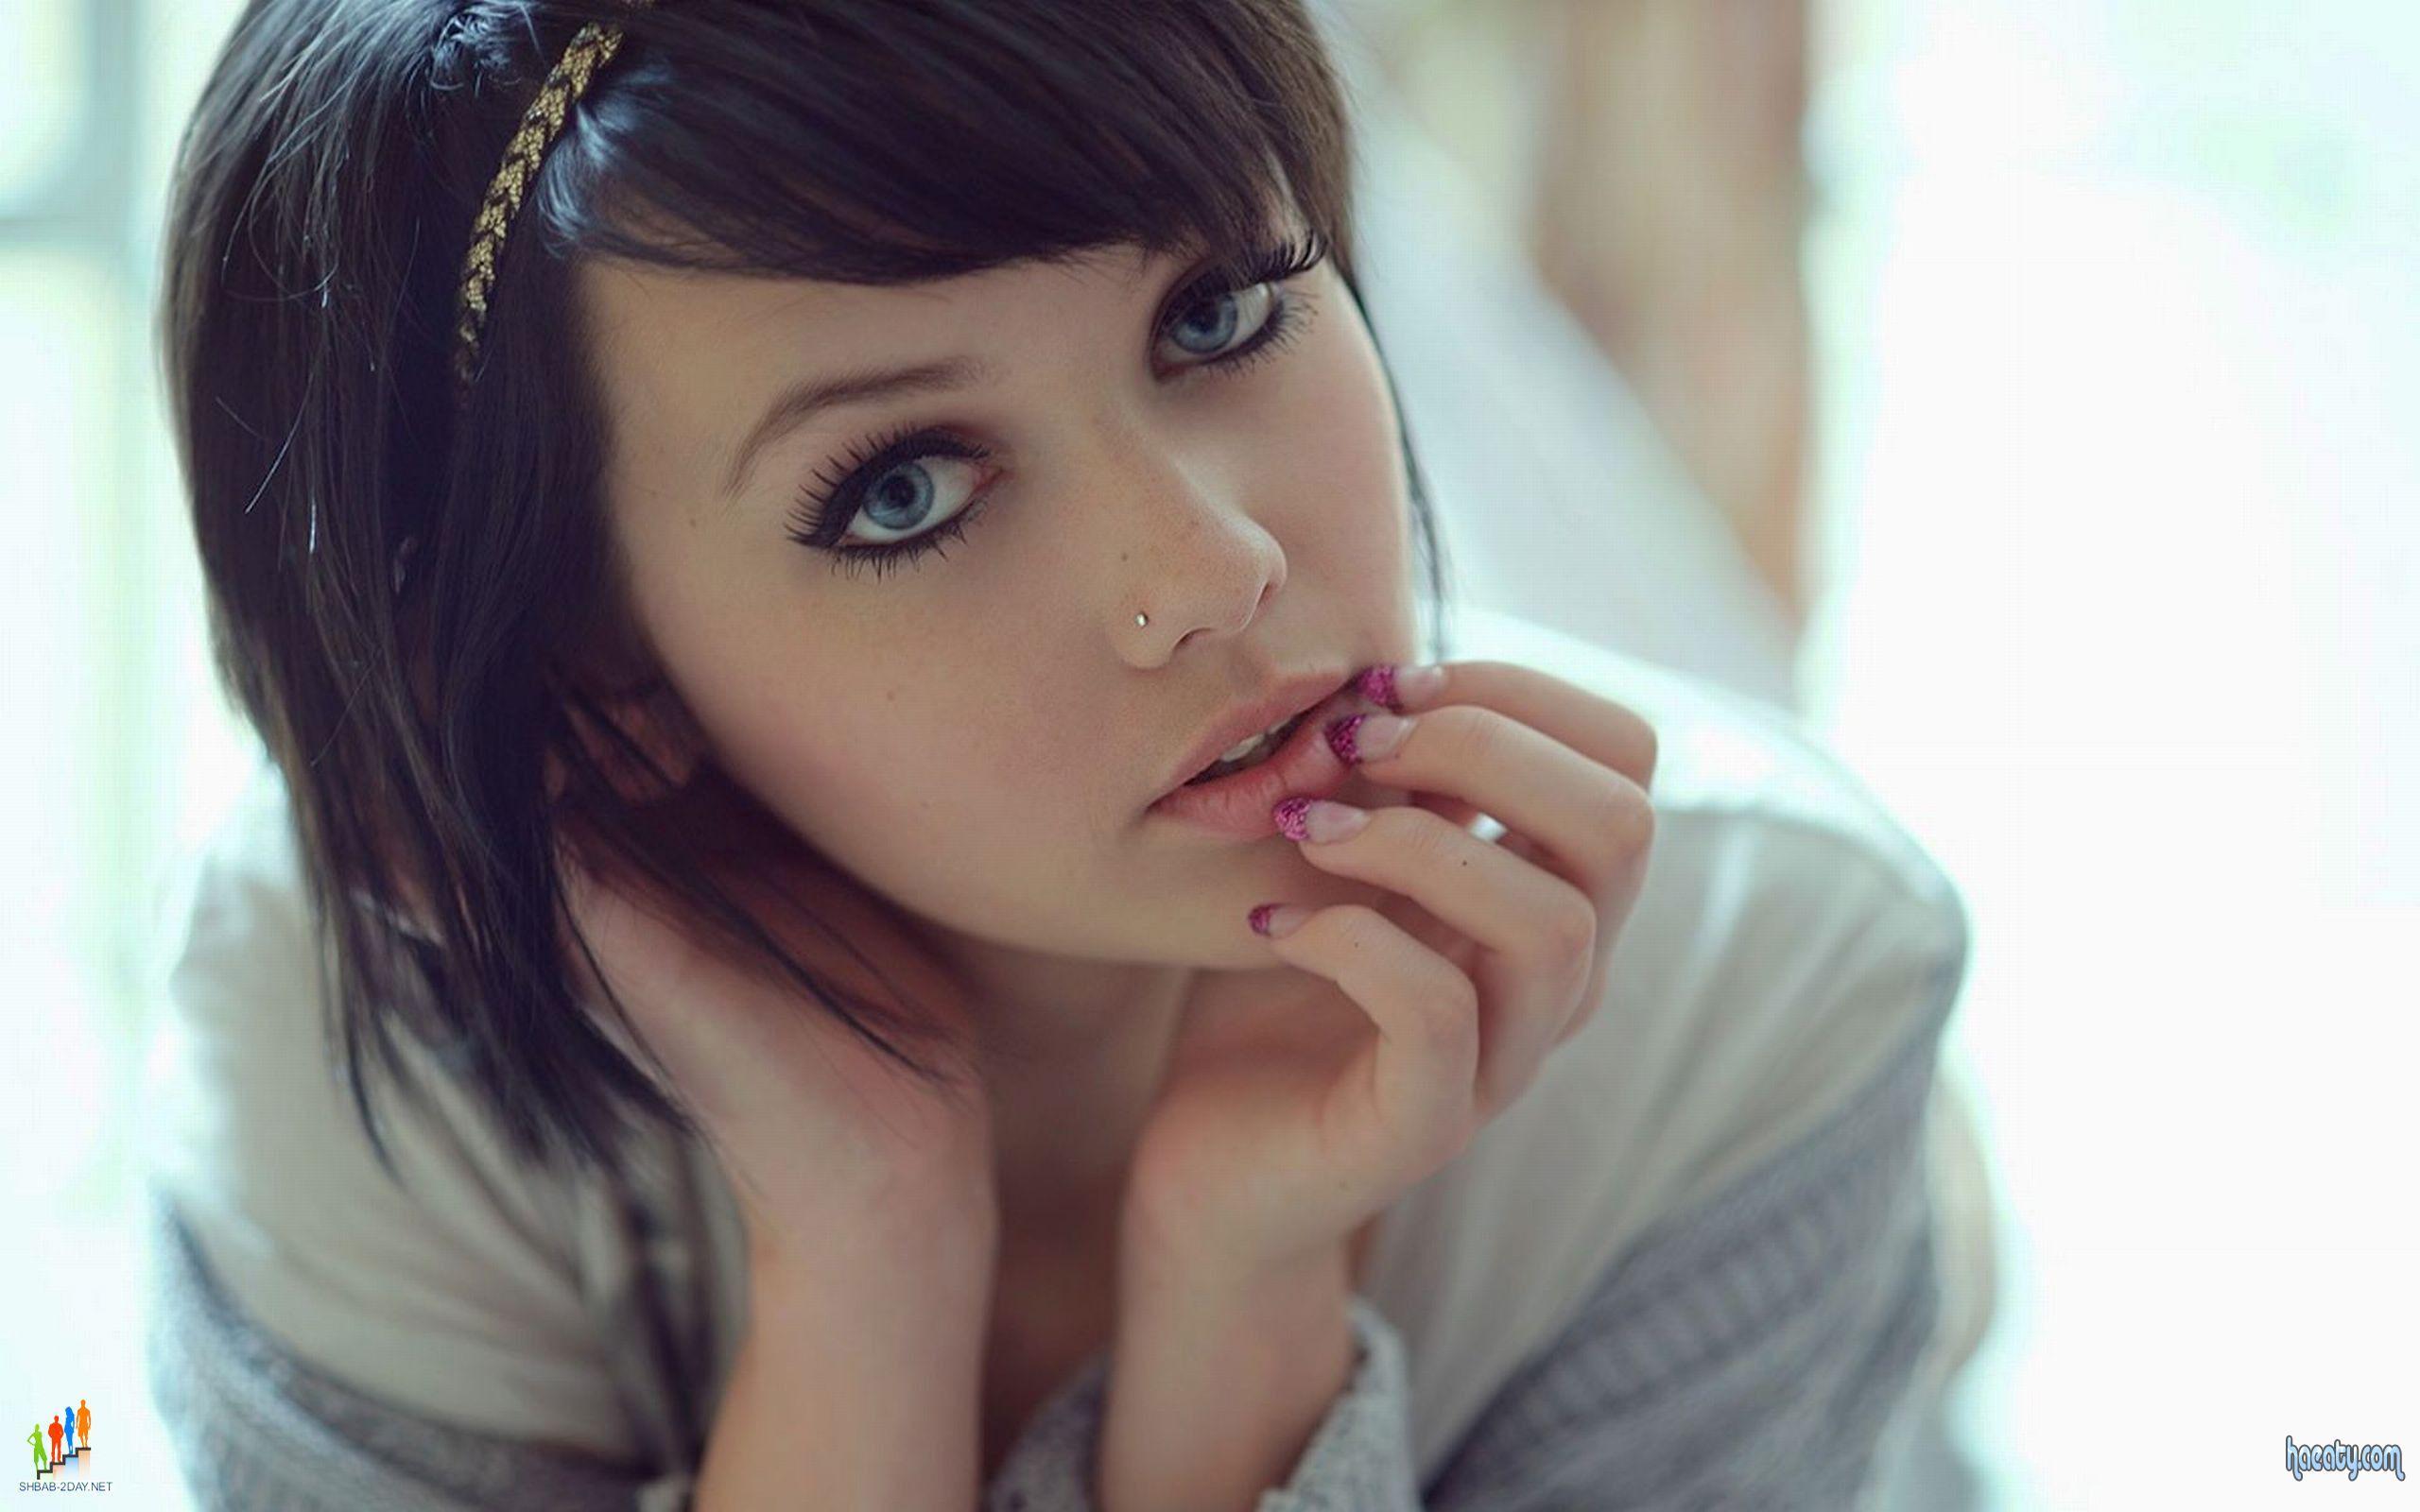 2014 2014 Beautiful girls wallpapers 1378248779183.jpg